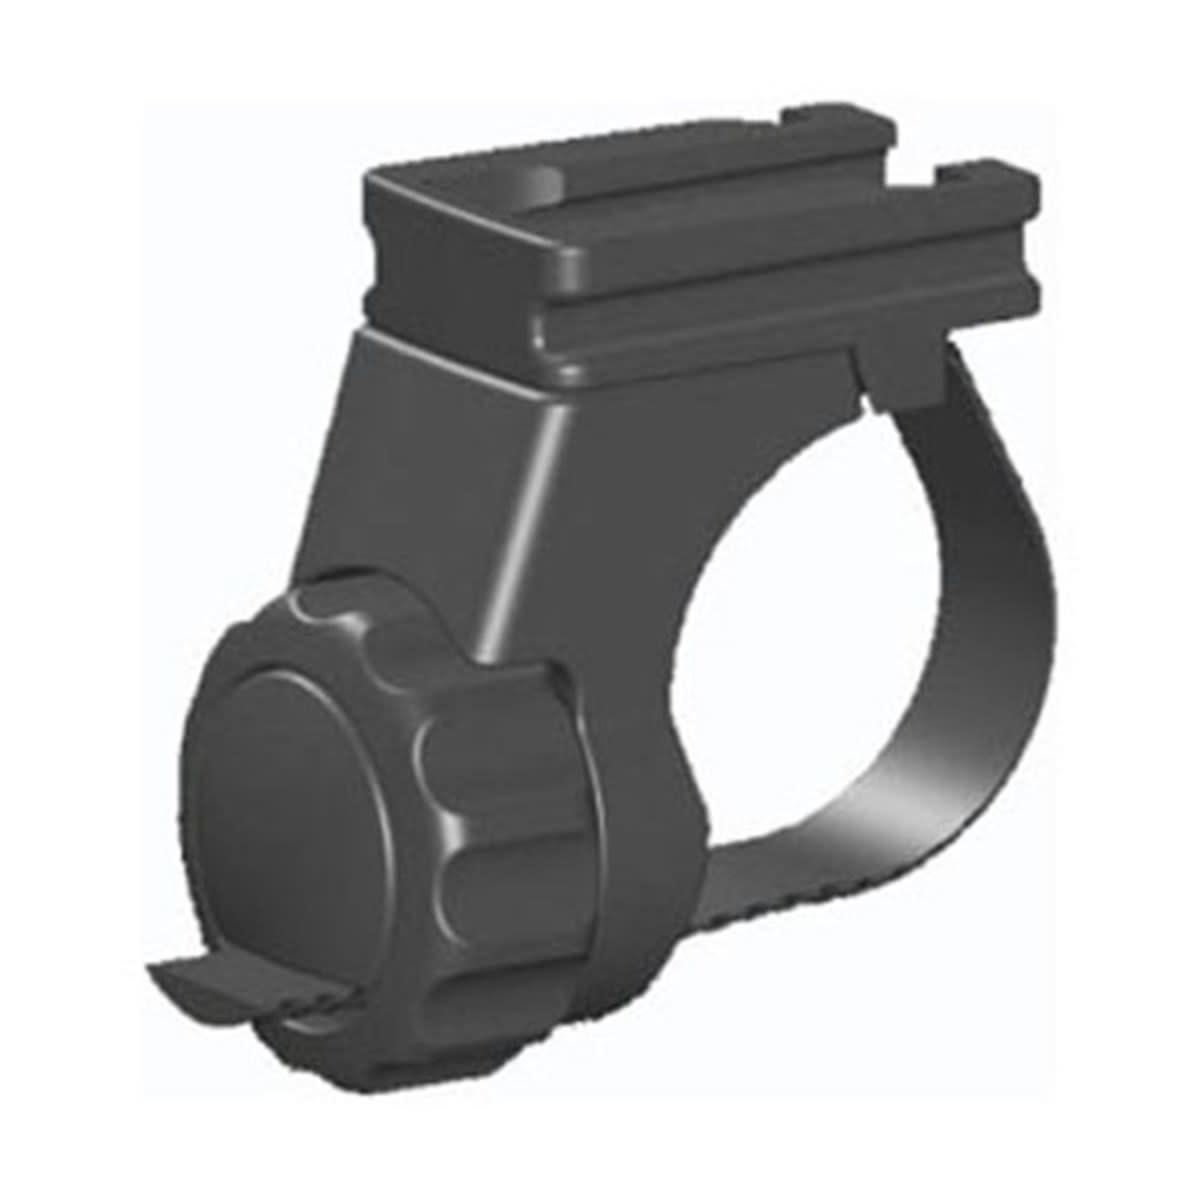 CATEYE H34 FLEX TIGHT BRACKET 22-32MM: